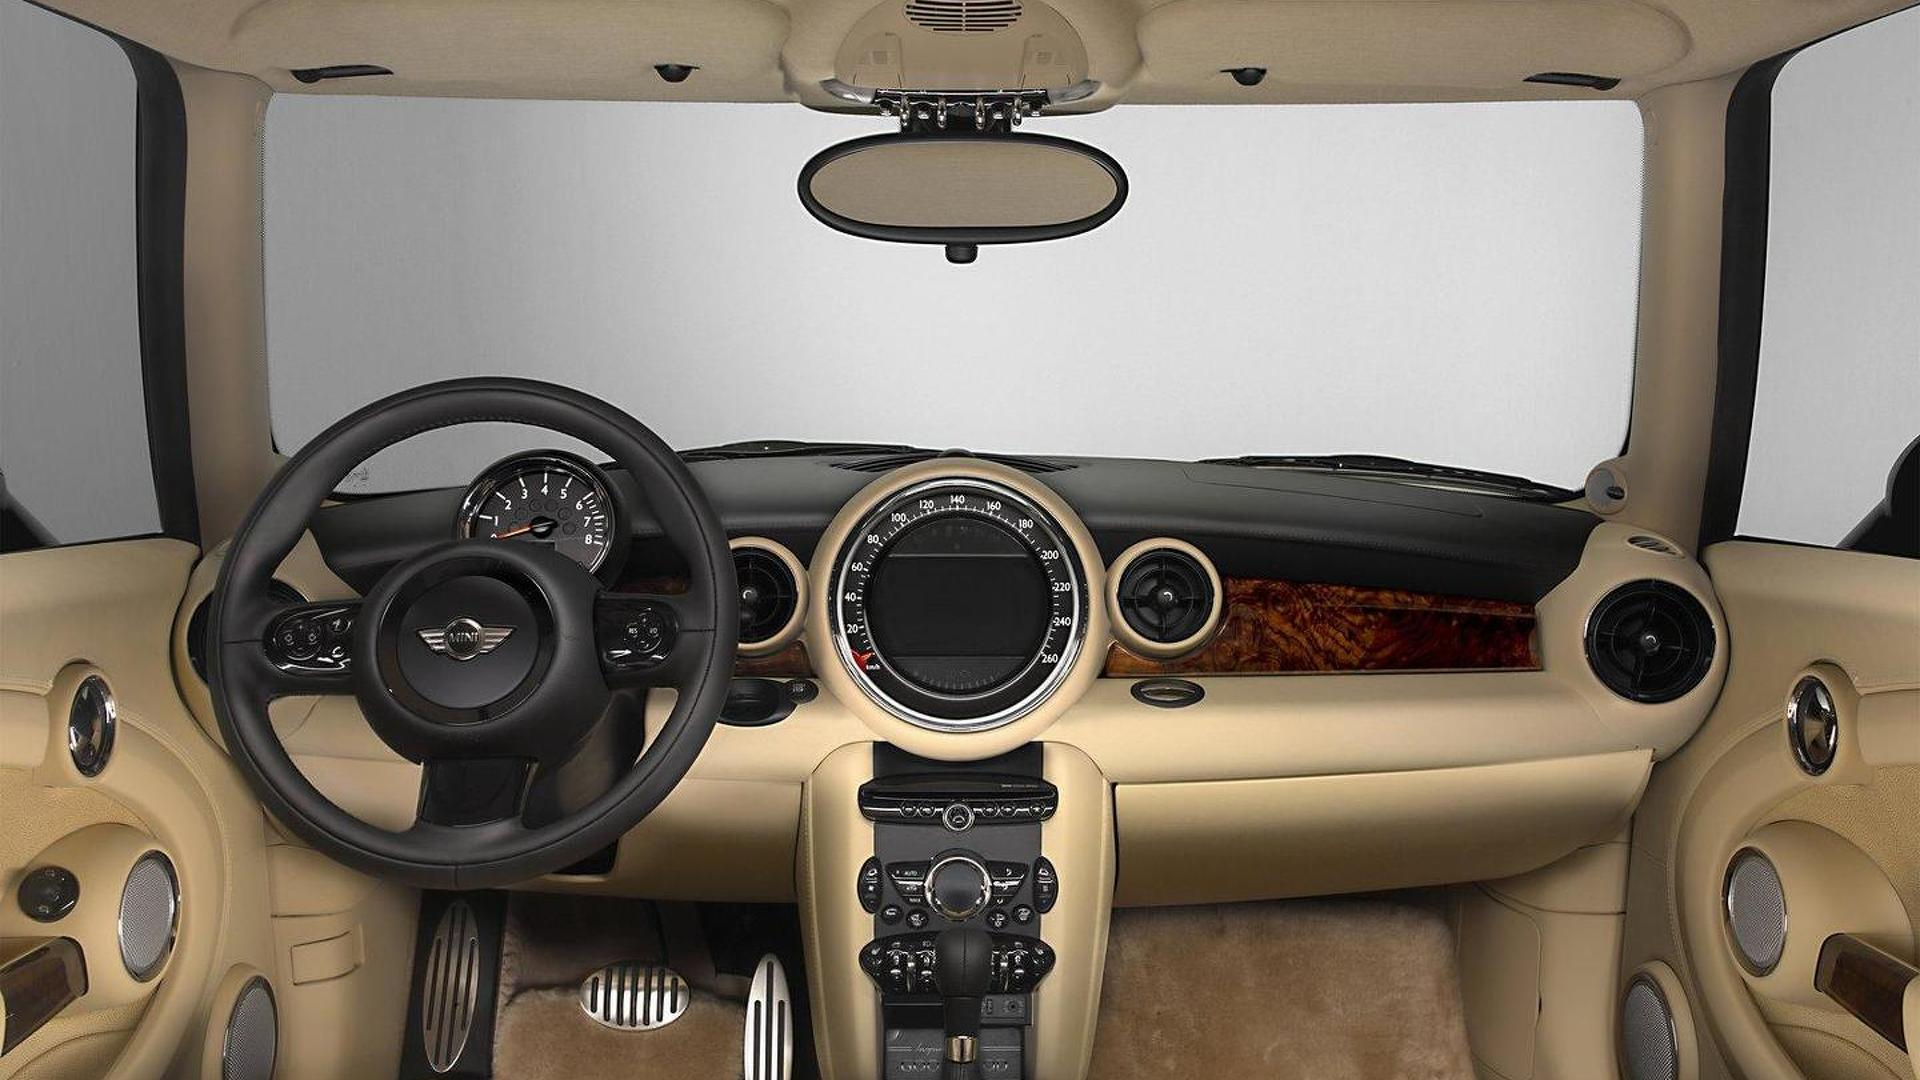 Mini Cooper Goodwood Gets Rolls Royce Inspired Pricing